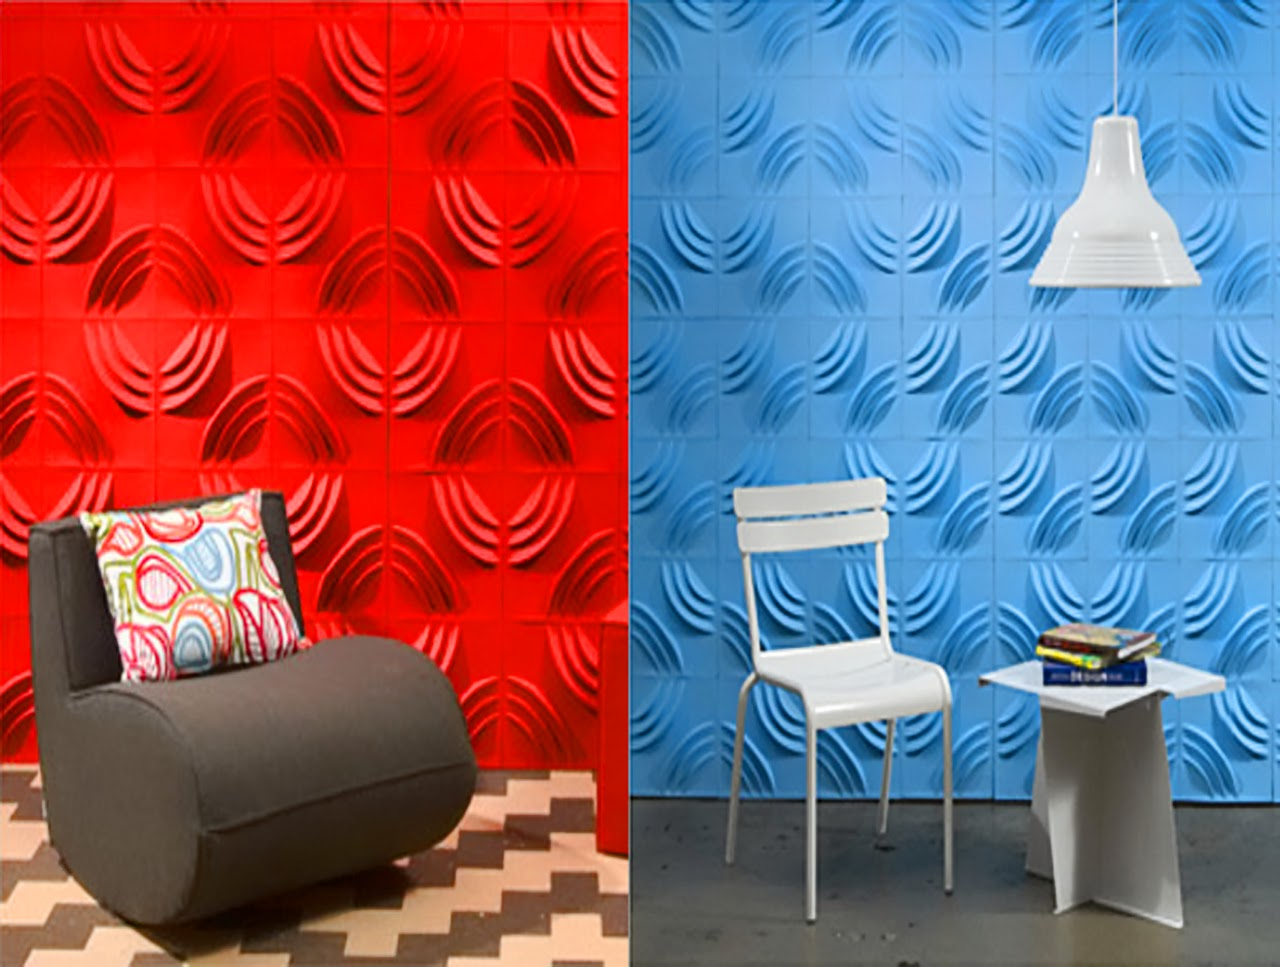 wallpaper ideas textured wallpaper ideas textured wallpaper ideas 1280x967